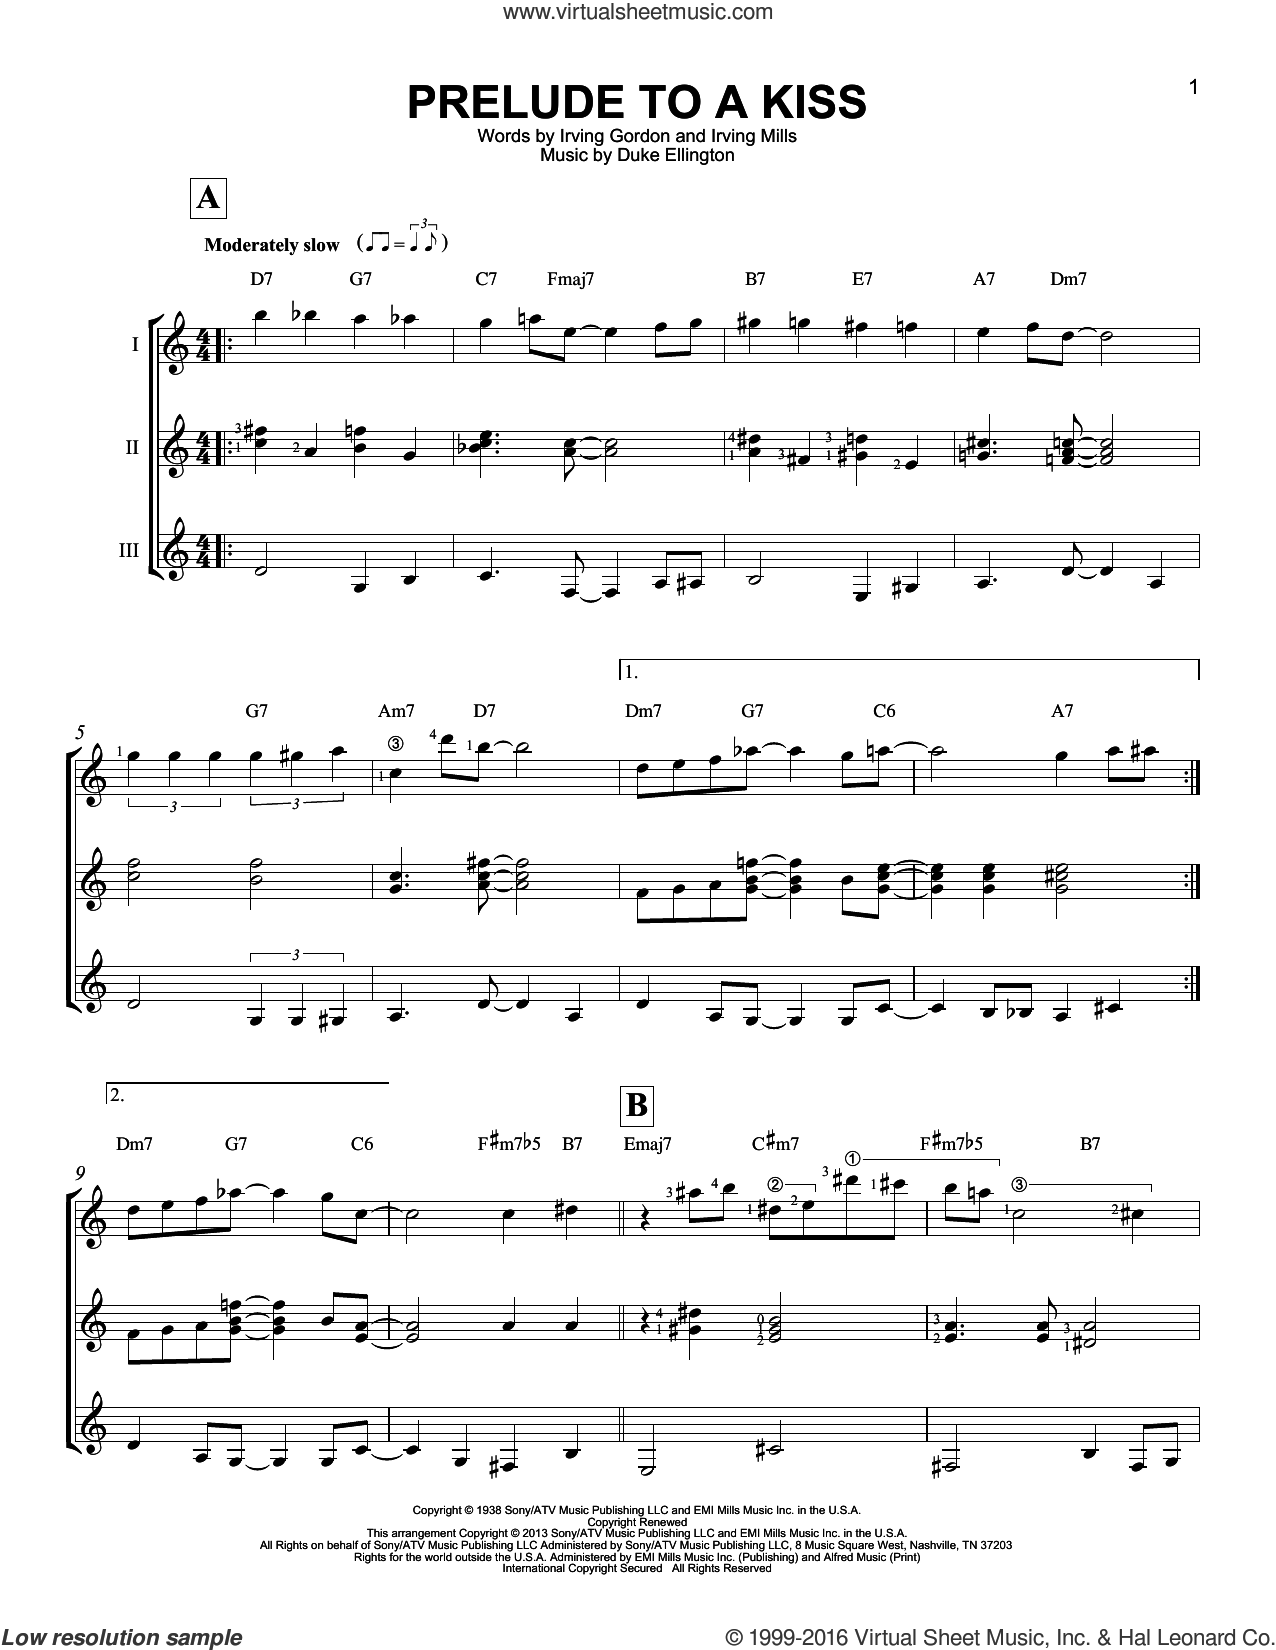 Prelude To A Kiss sheet music for guitar ensemble by Duke Ellington, Irving Gordon and Irving Mills, intermediate skill level